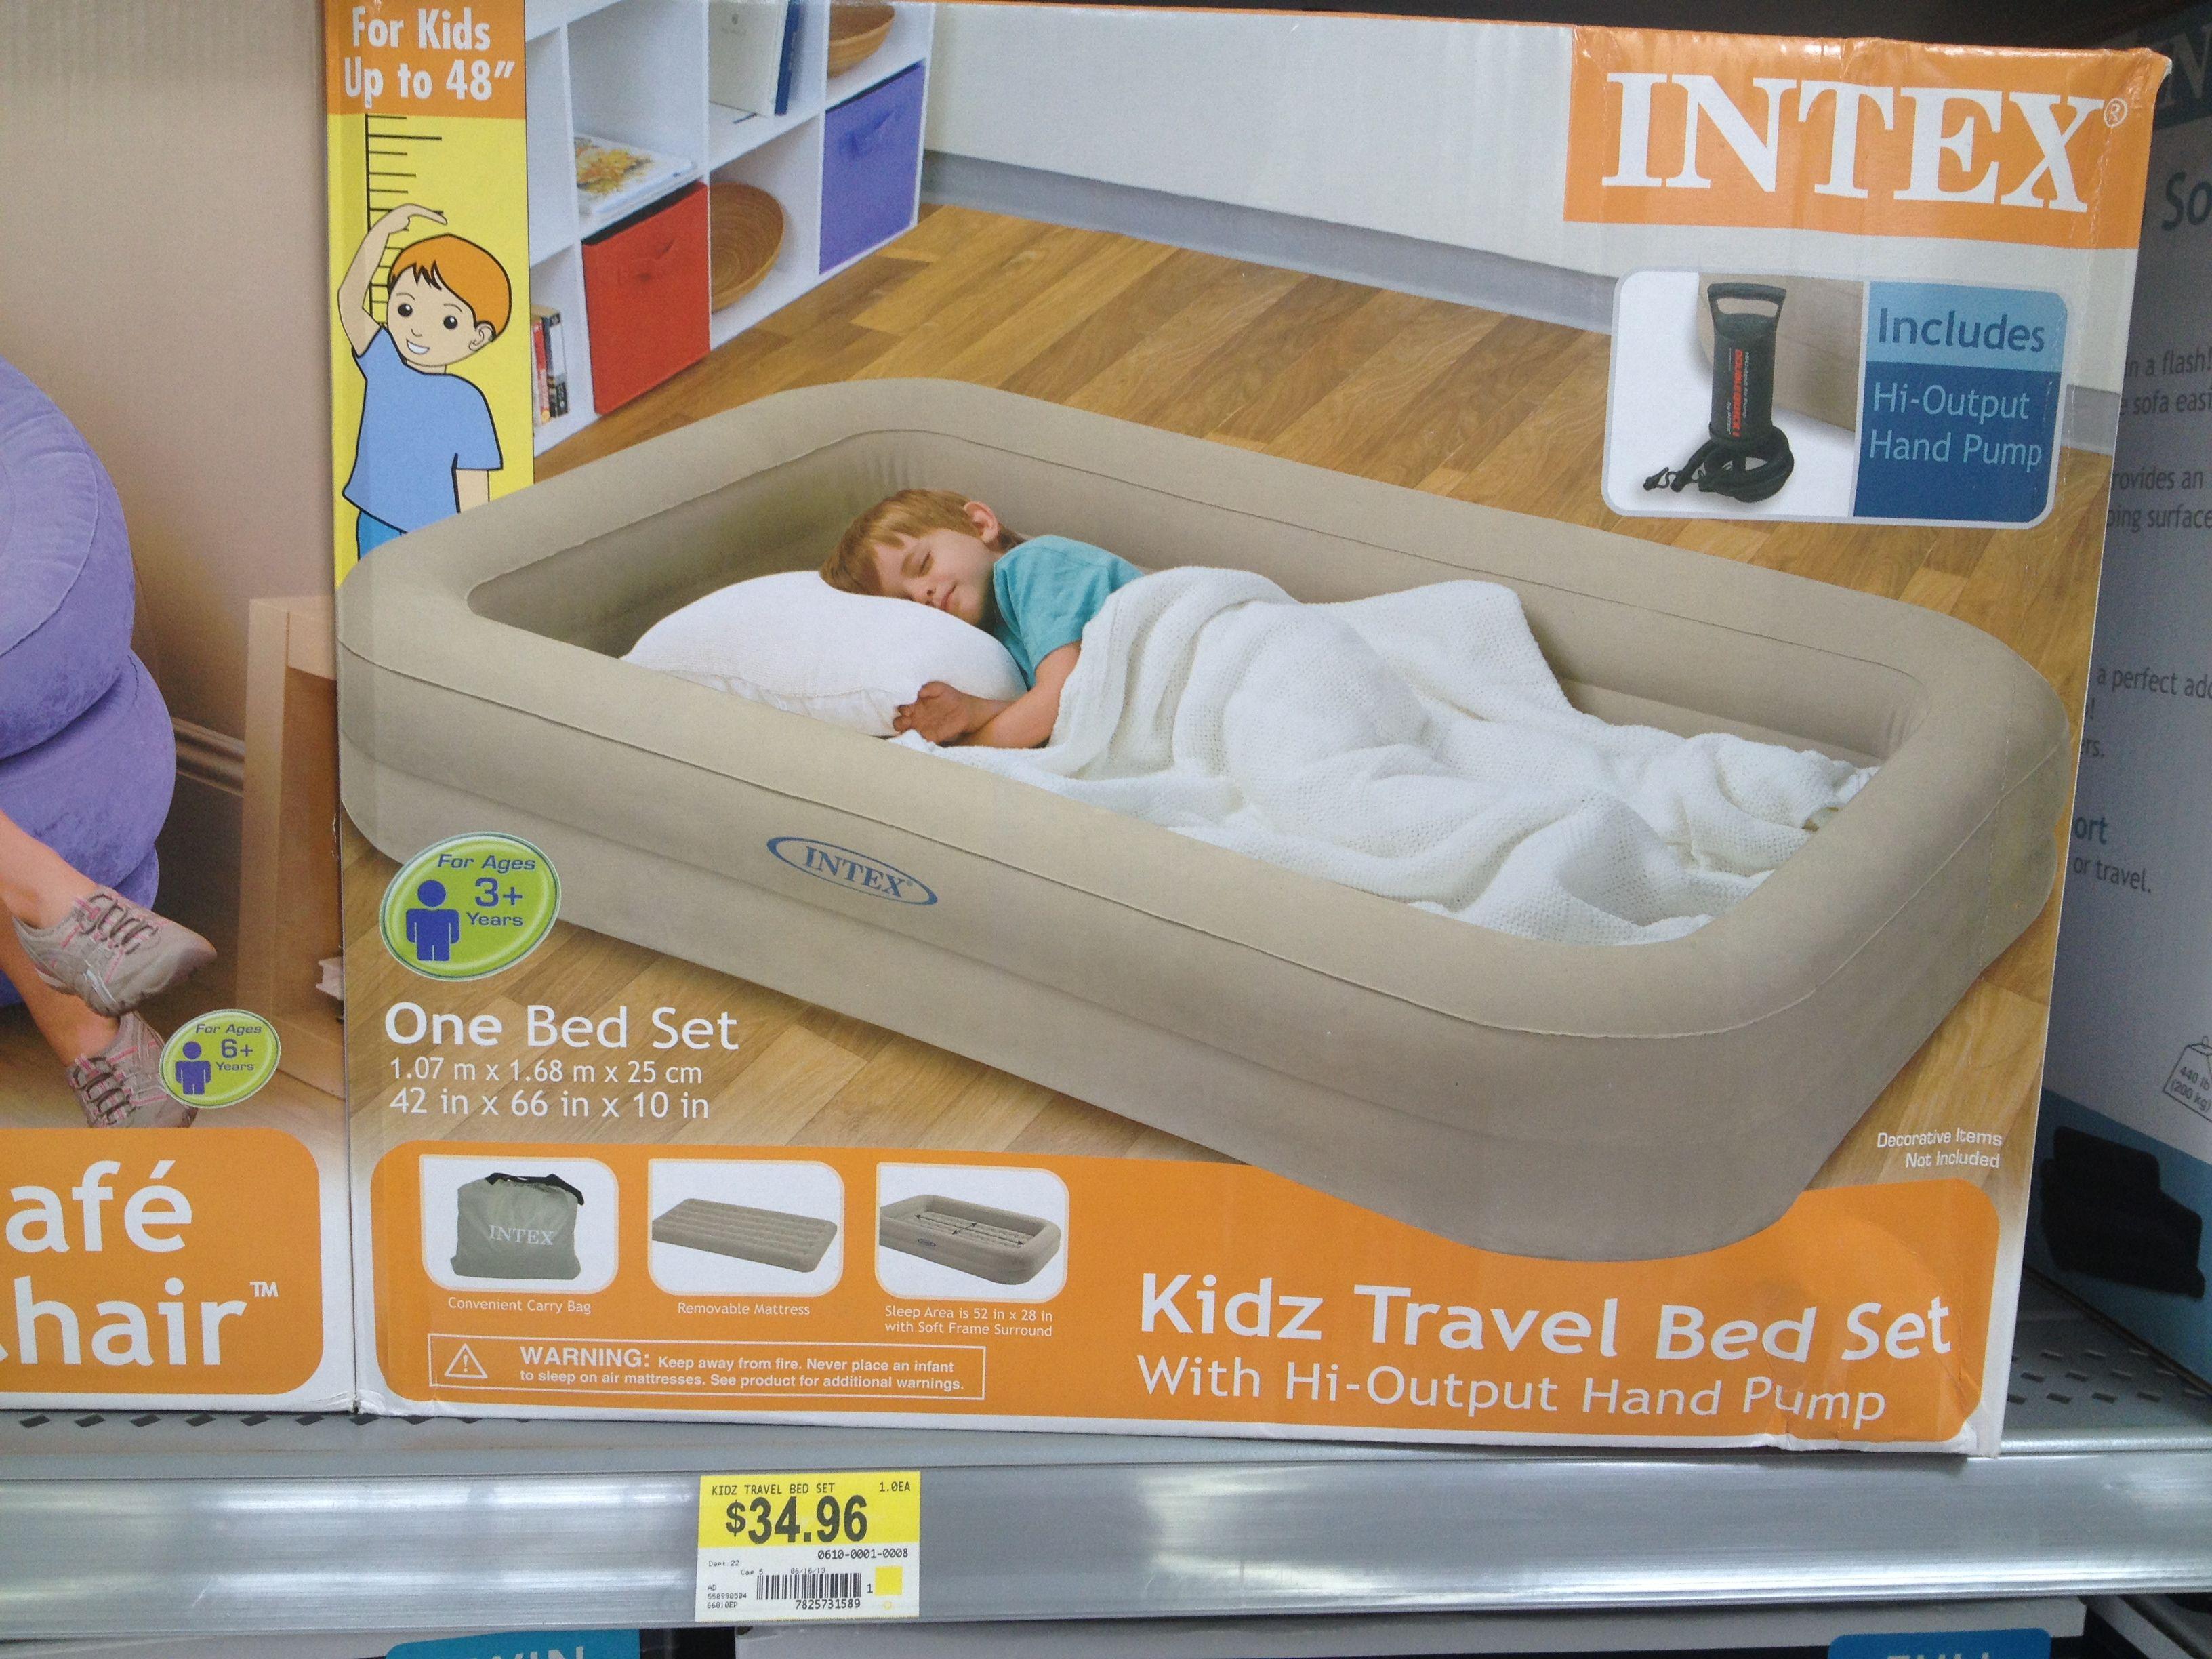 intex blow up air mattress from walmart. this has great reviews and